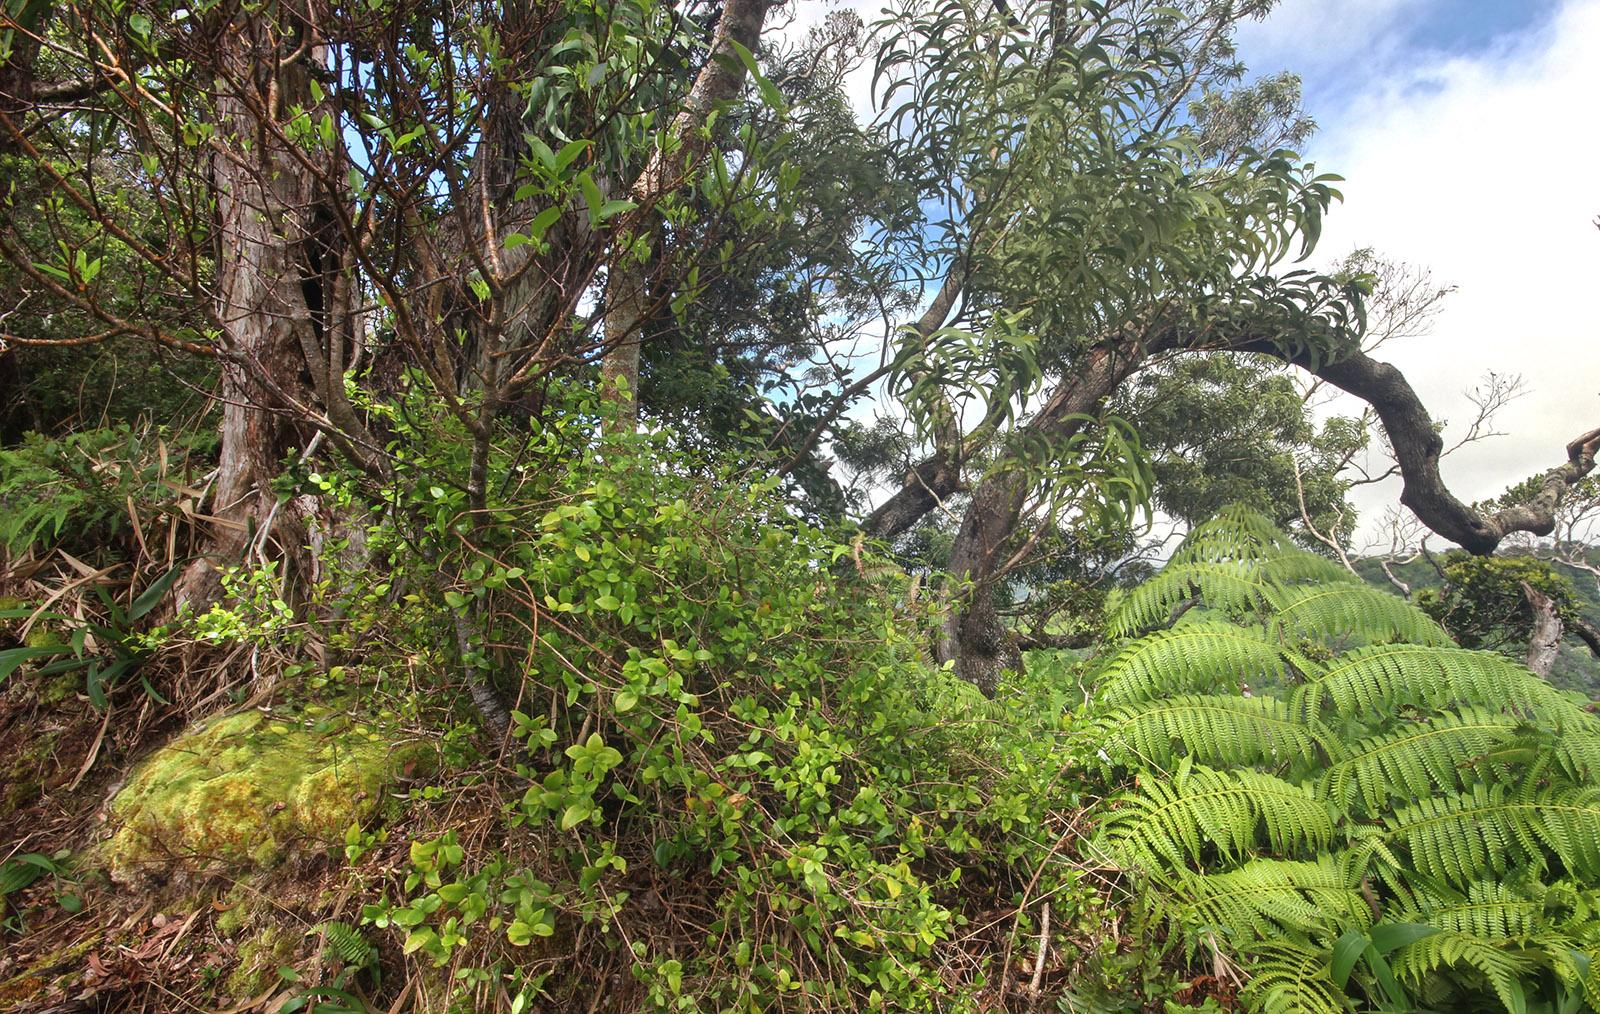 Maile plante hawaii